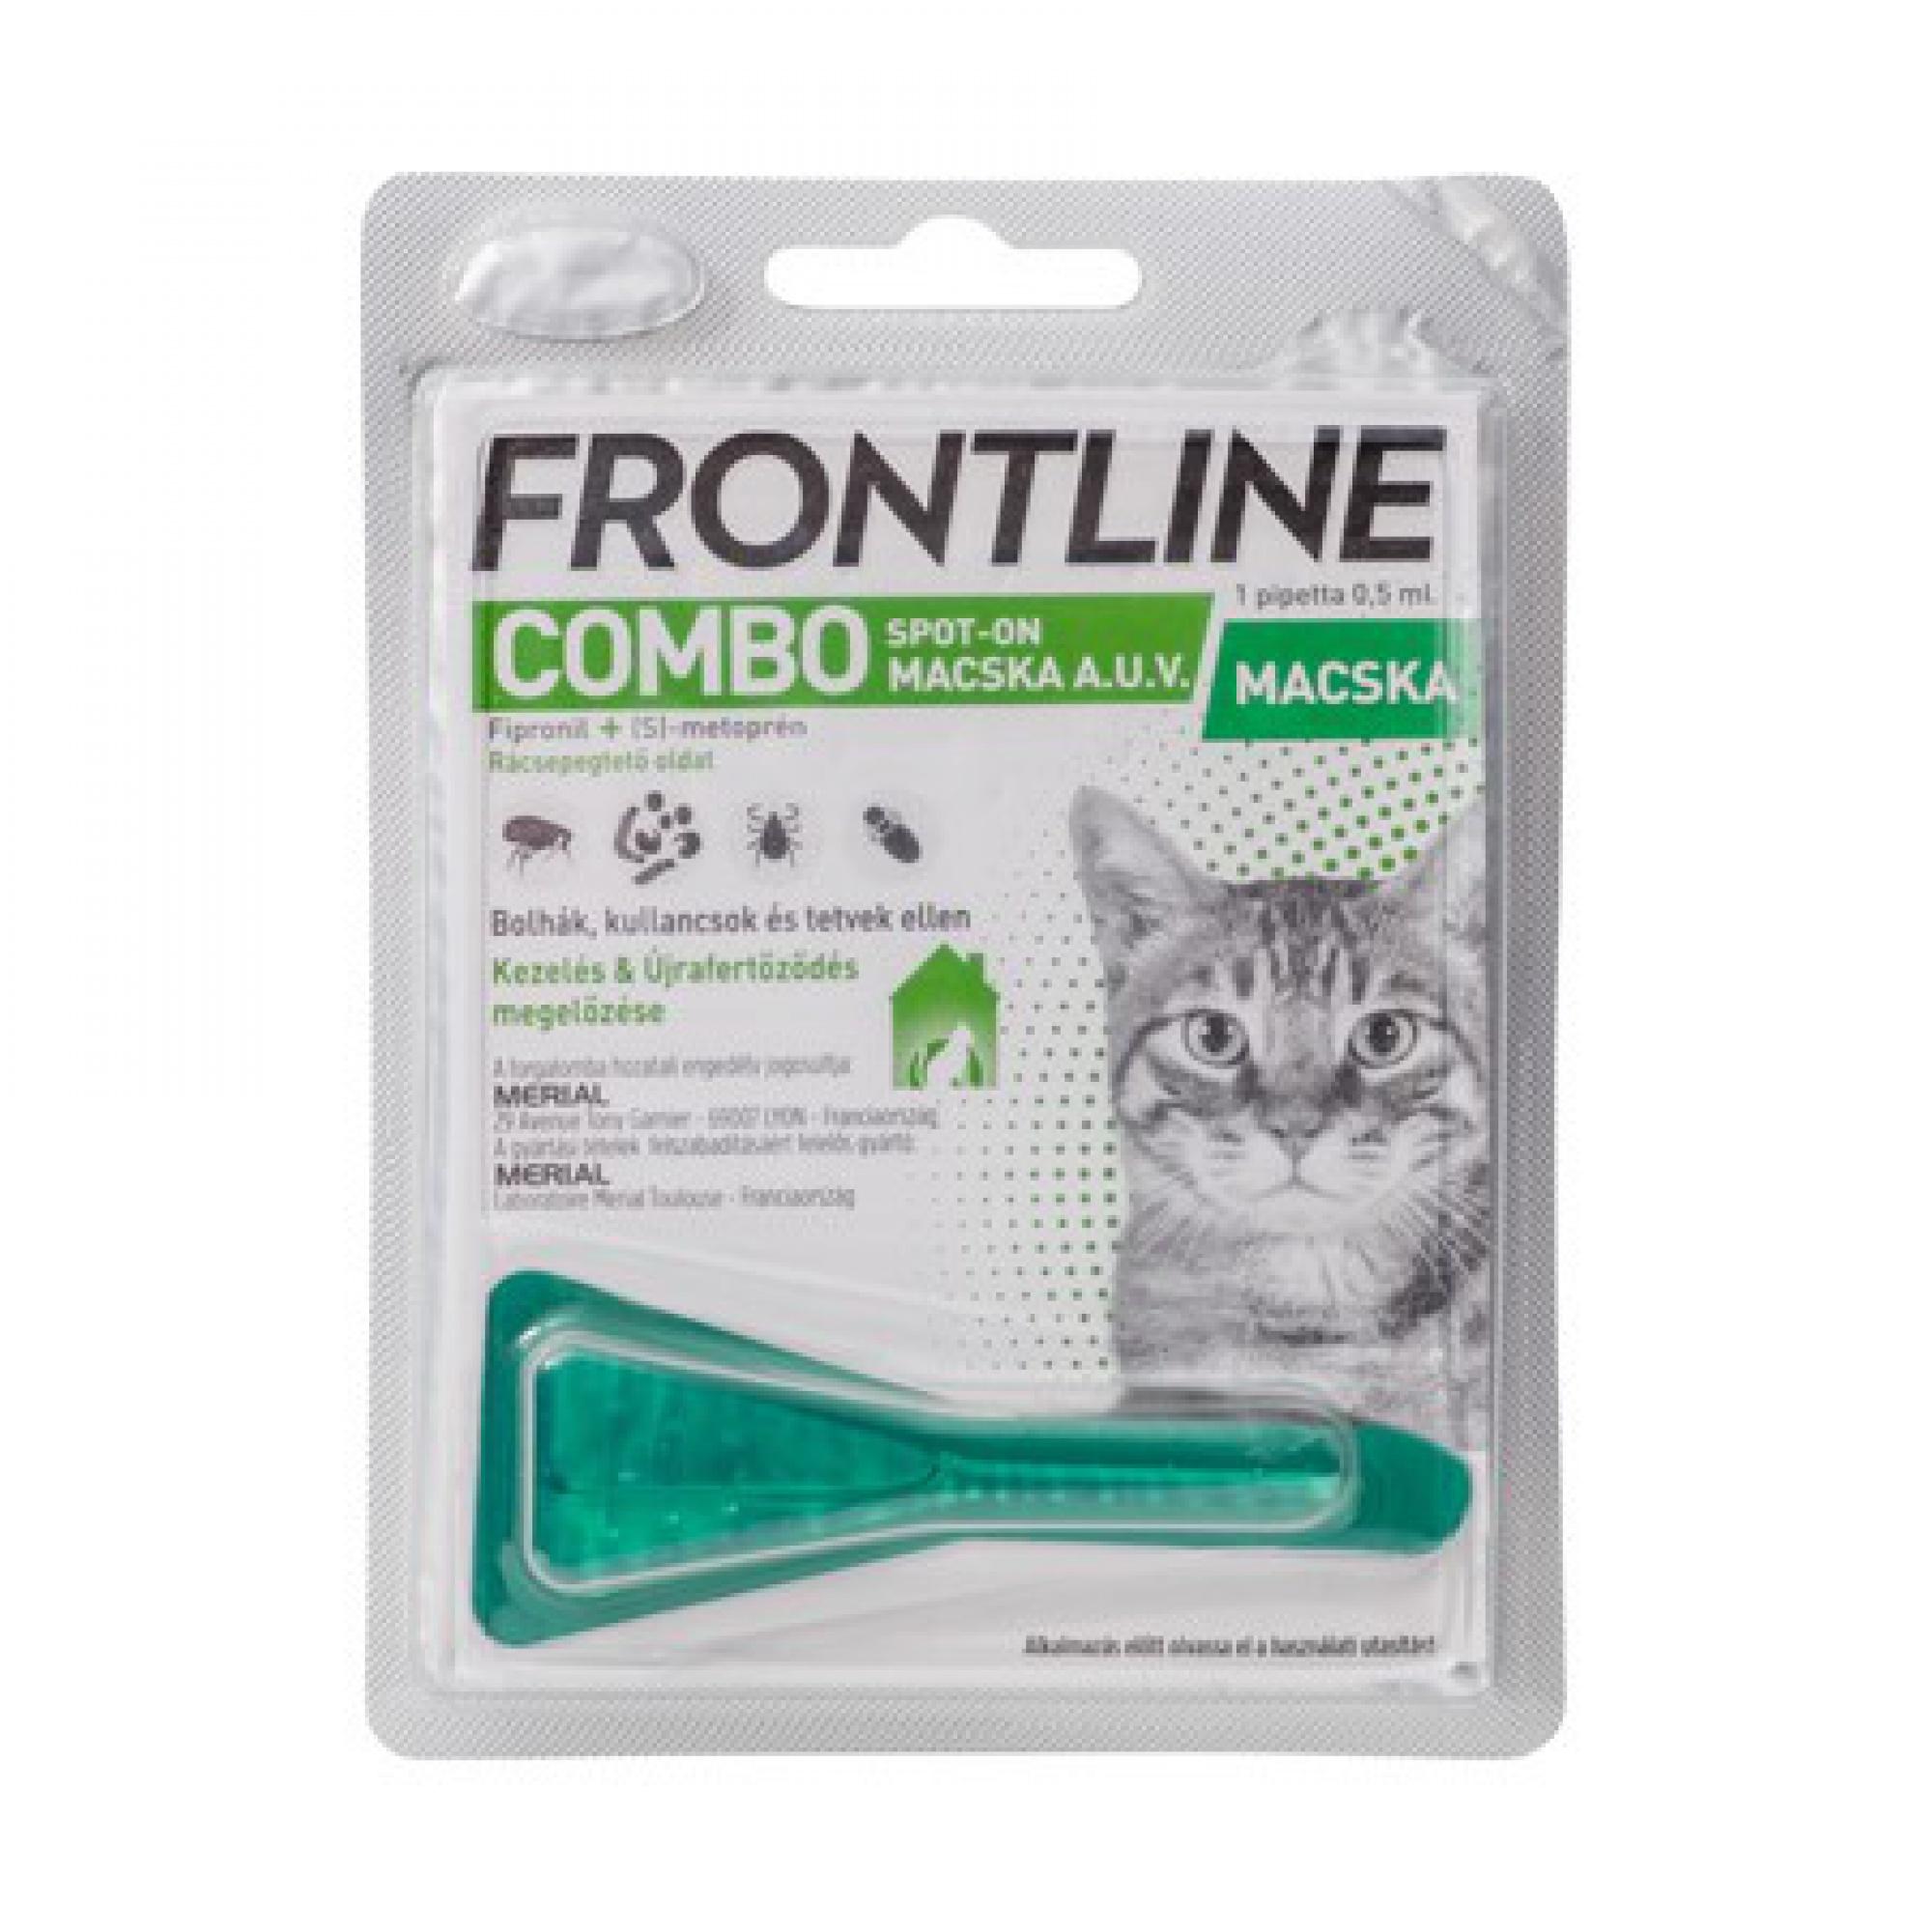 frontline-combo-spot-on-macska__trashed